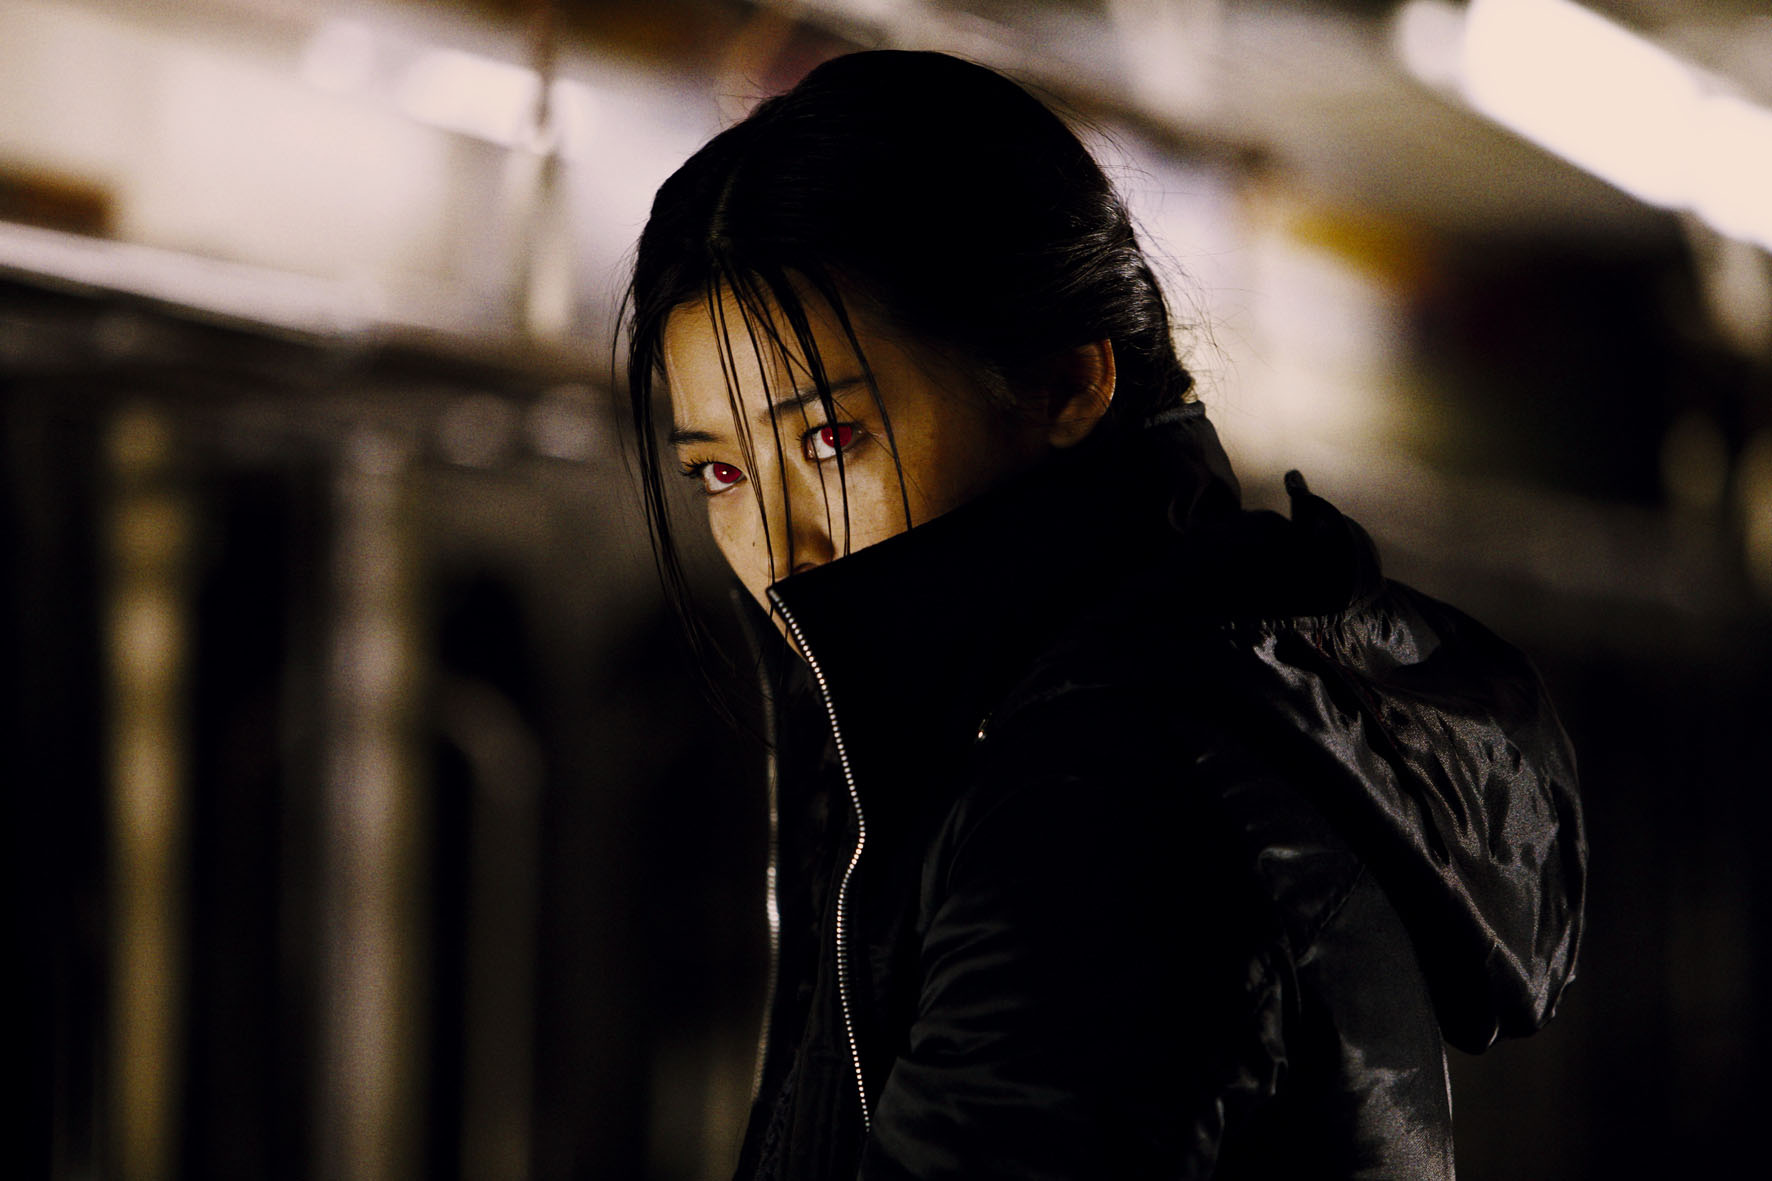 دانلود فیلم ژاپنی آخرین خوناشام